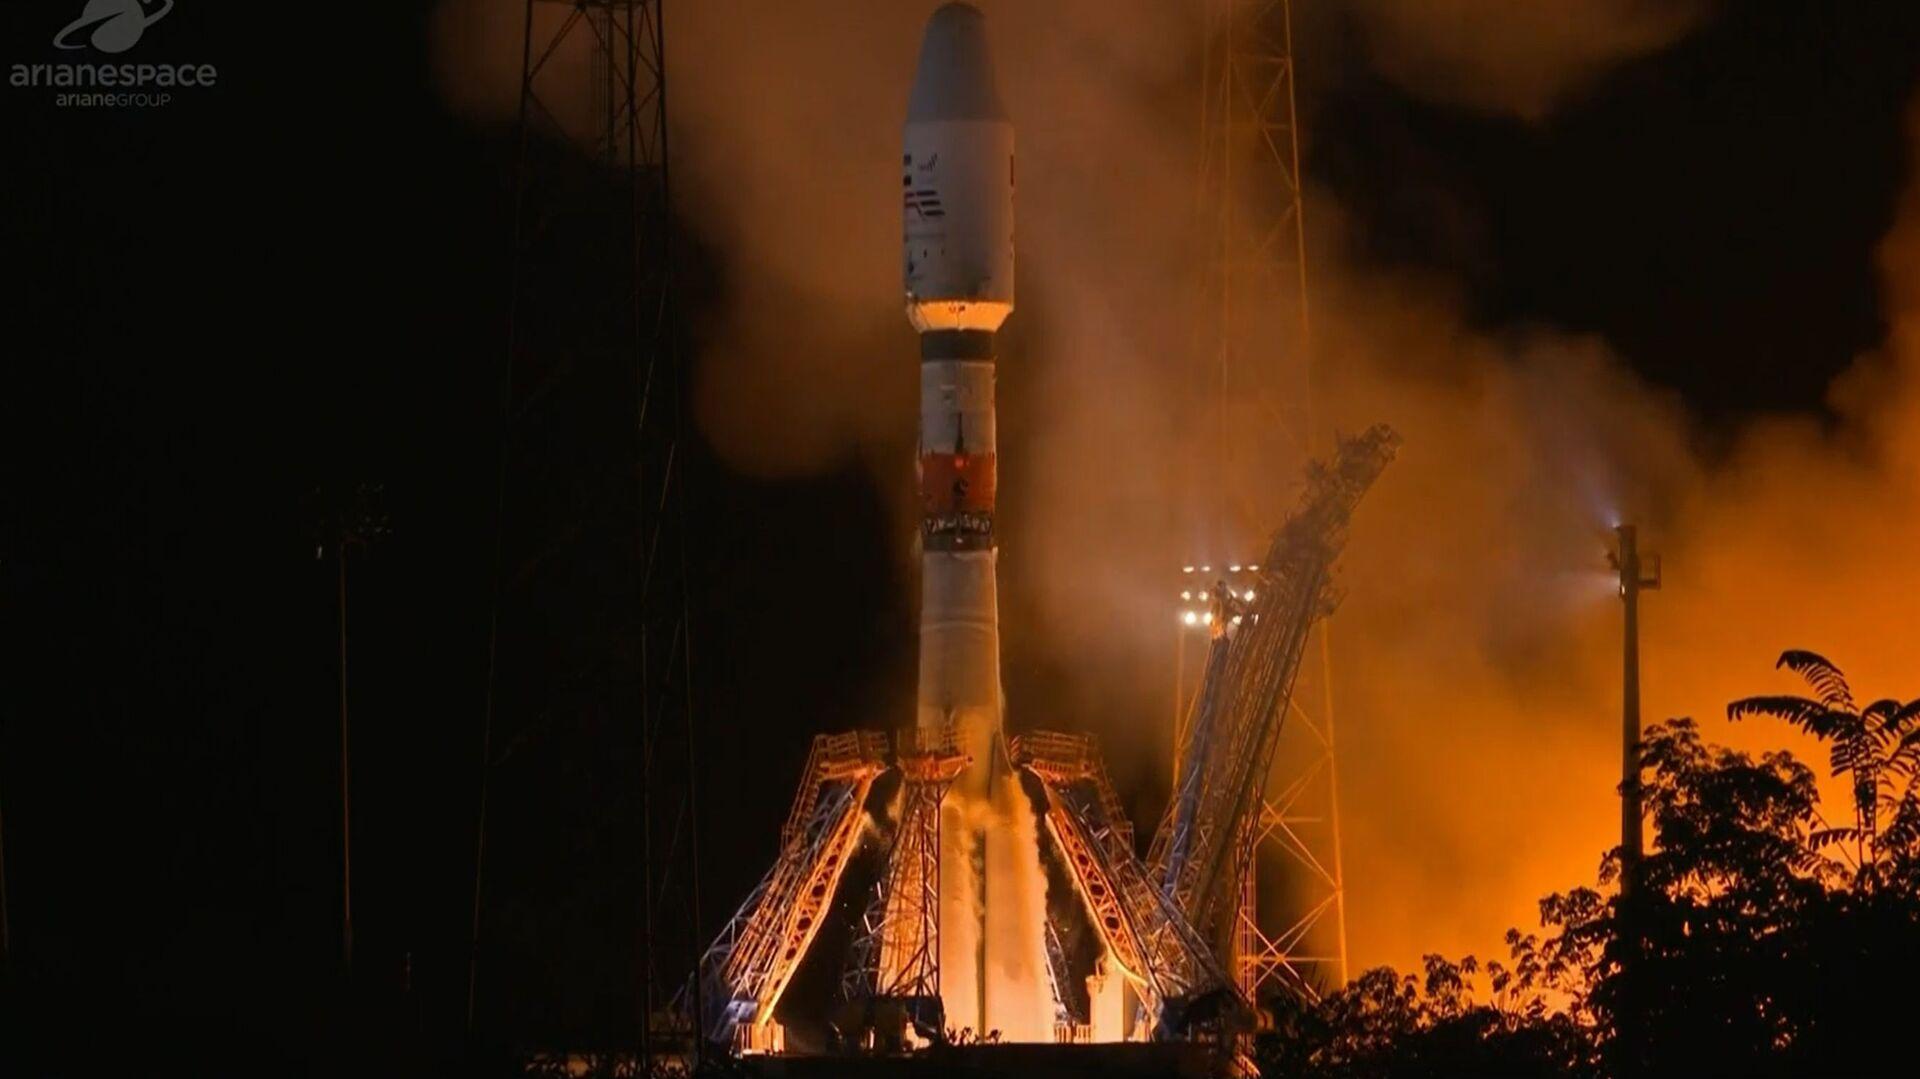 Ruská nosná raketa Sojuz se satelitem SAE Falcon Eye při startu - Sputnik Česká republika, 1920, 27.04.2021